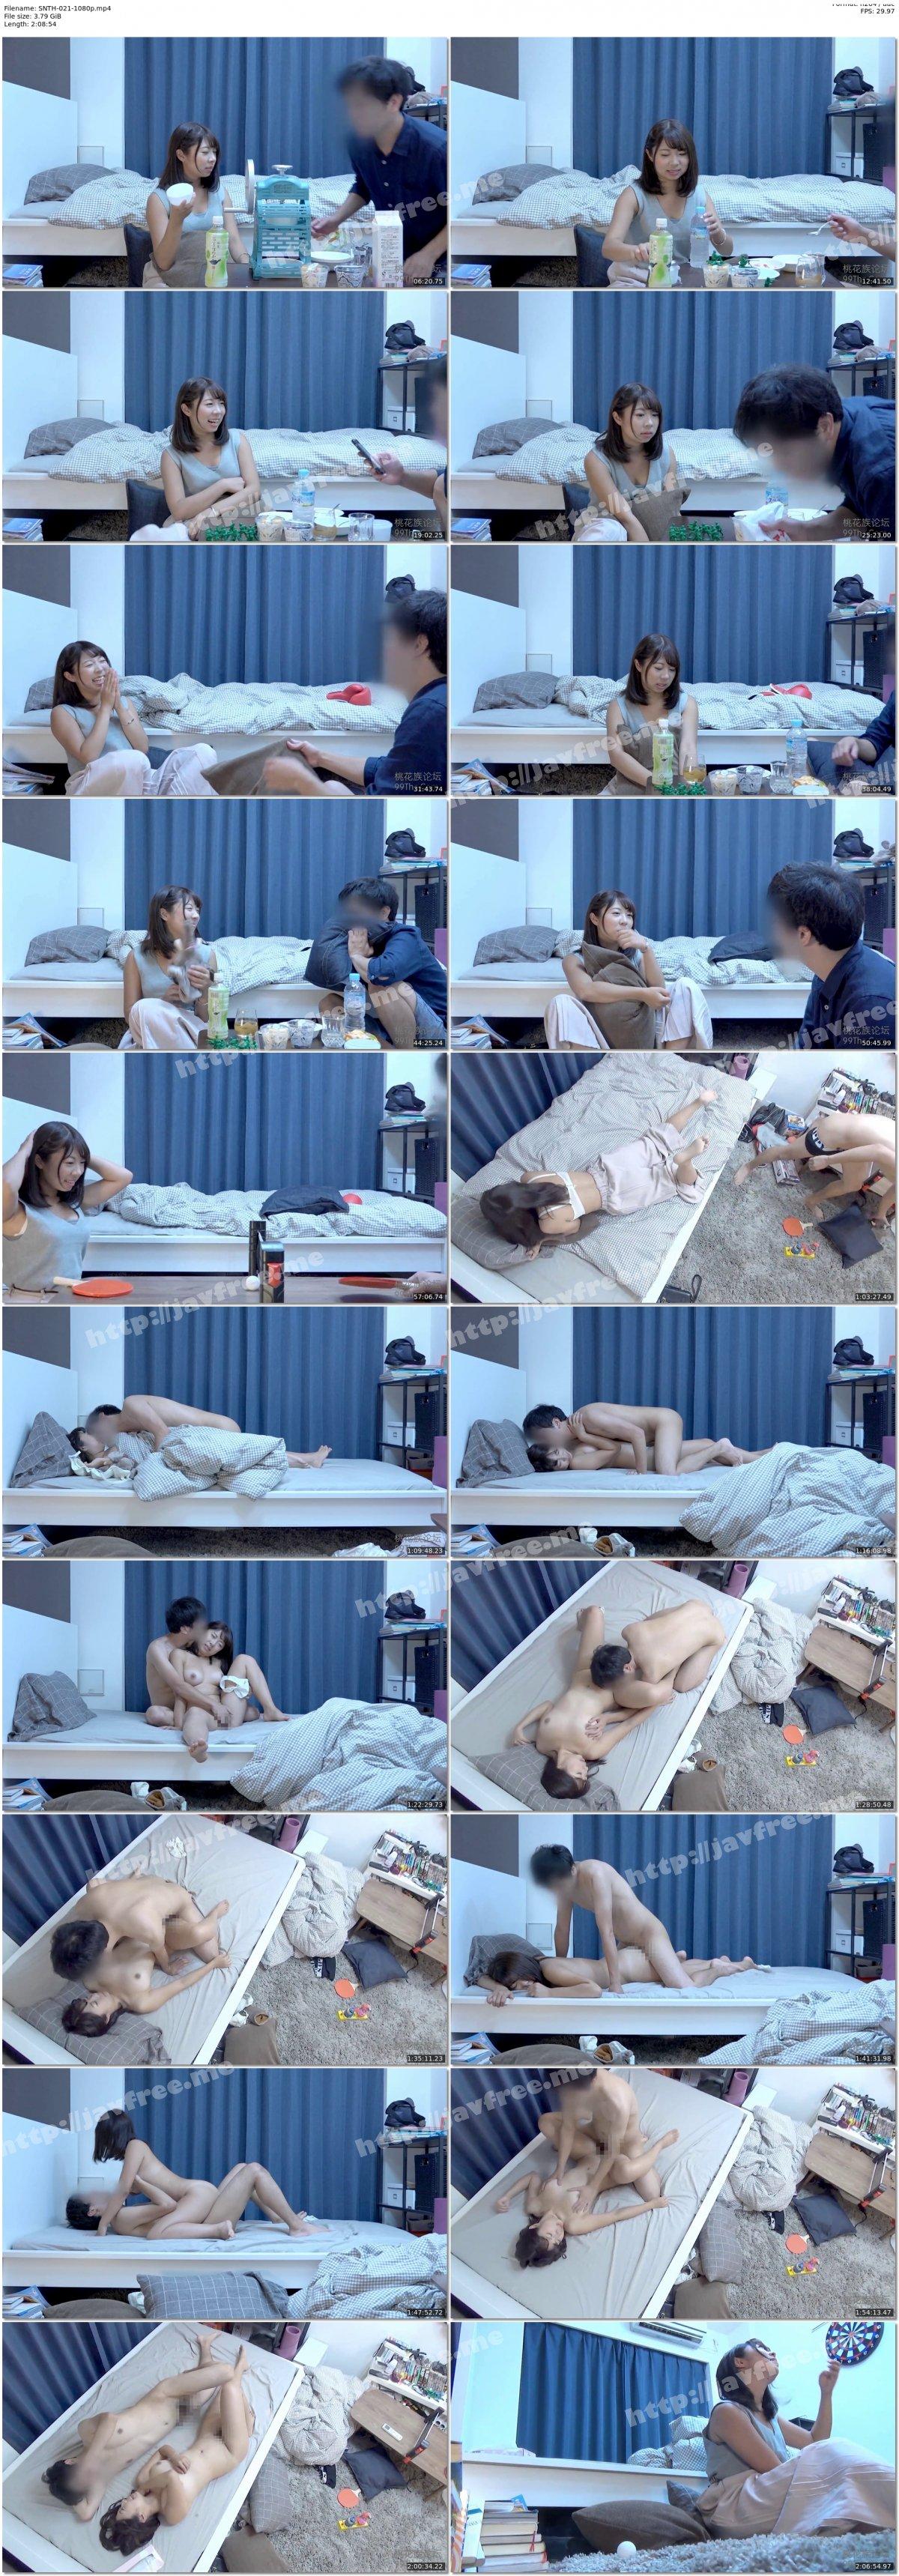 [ONEZ-105] 濃密な接吻と本気の性交。VOL.001 波木はるか - image SNTH-021-1080p on https://javfree.me